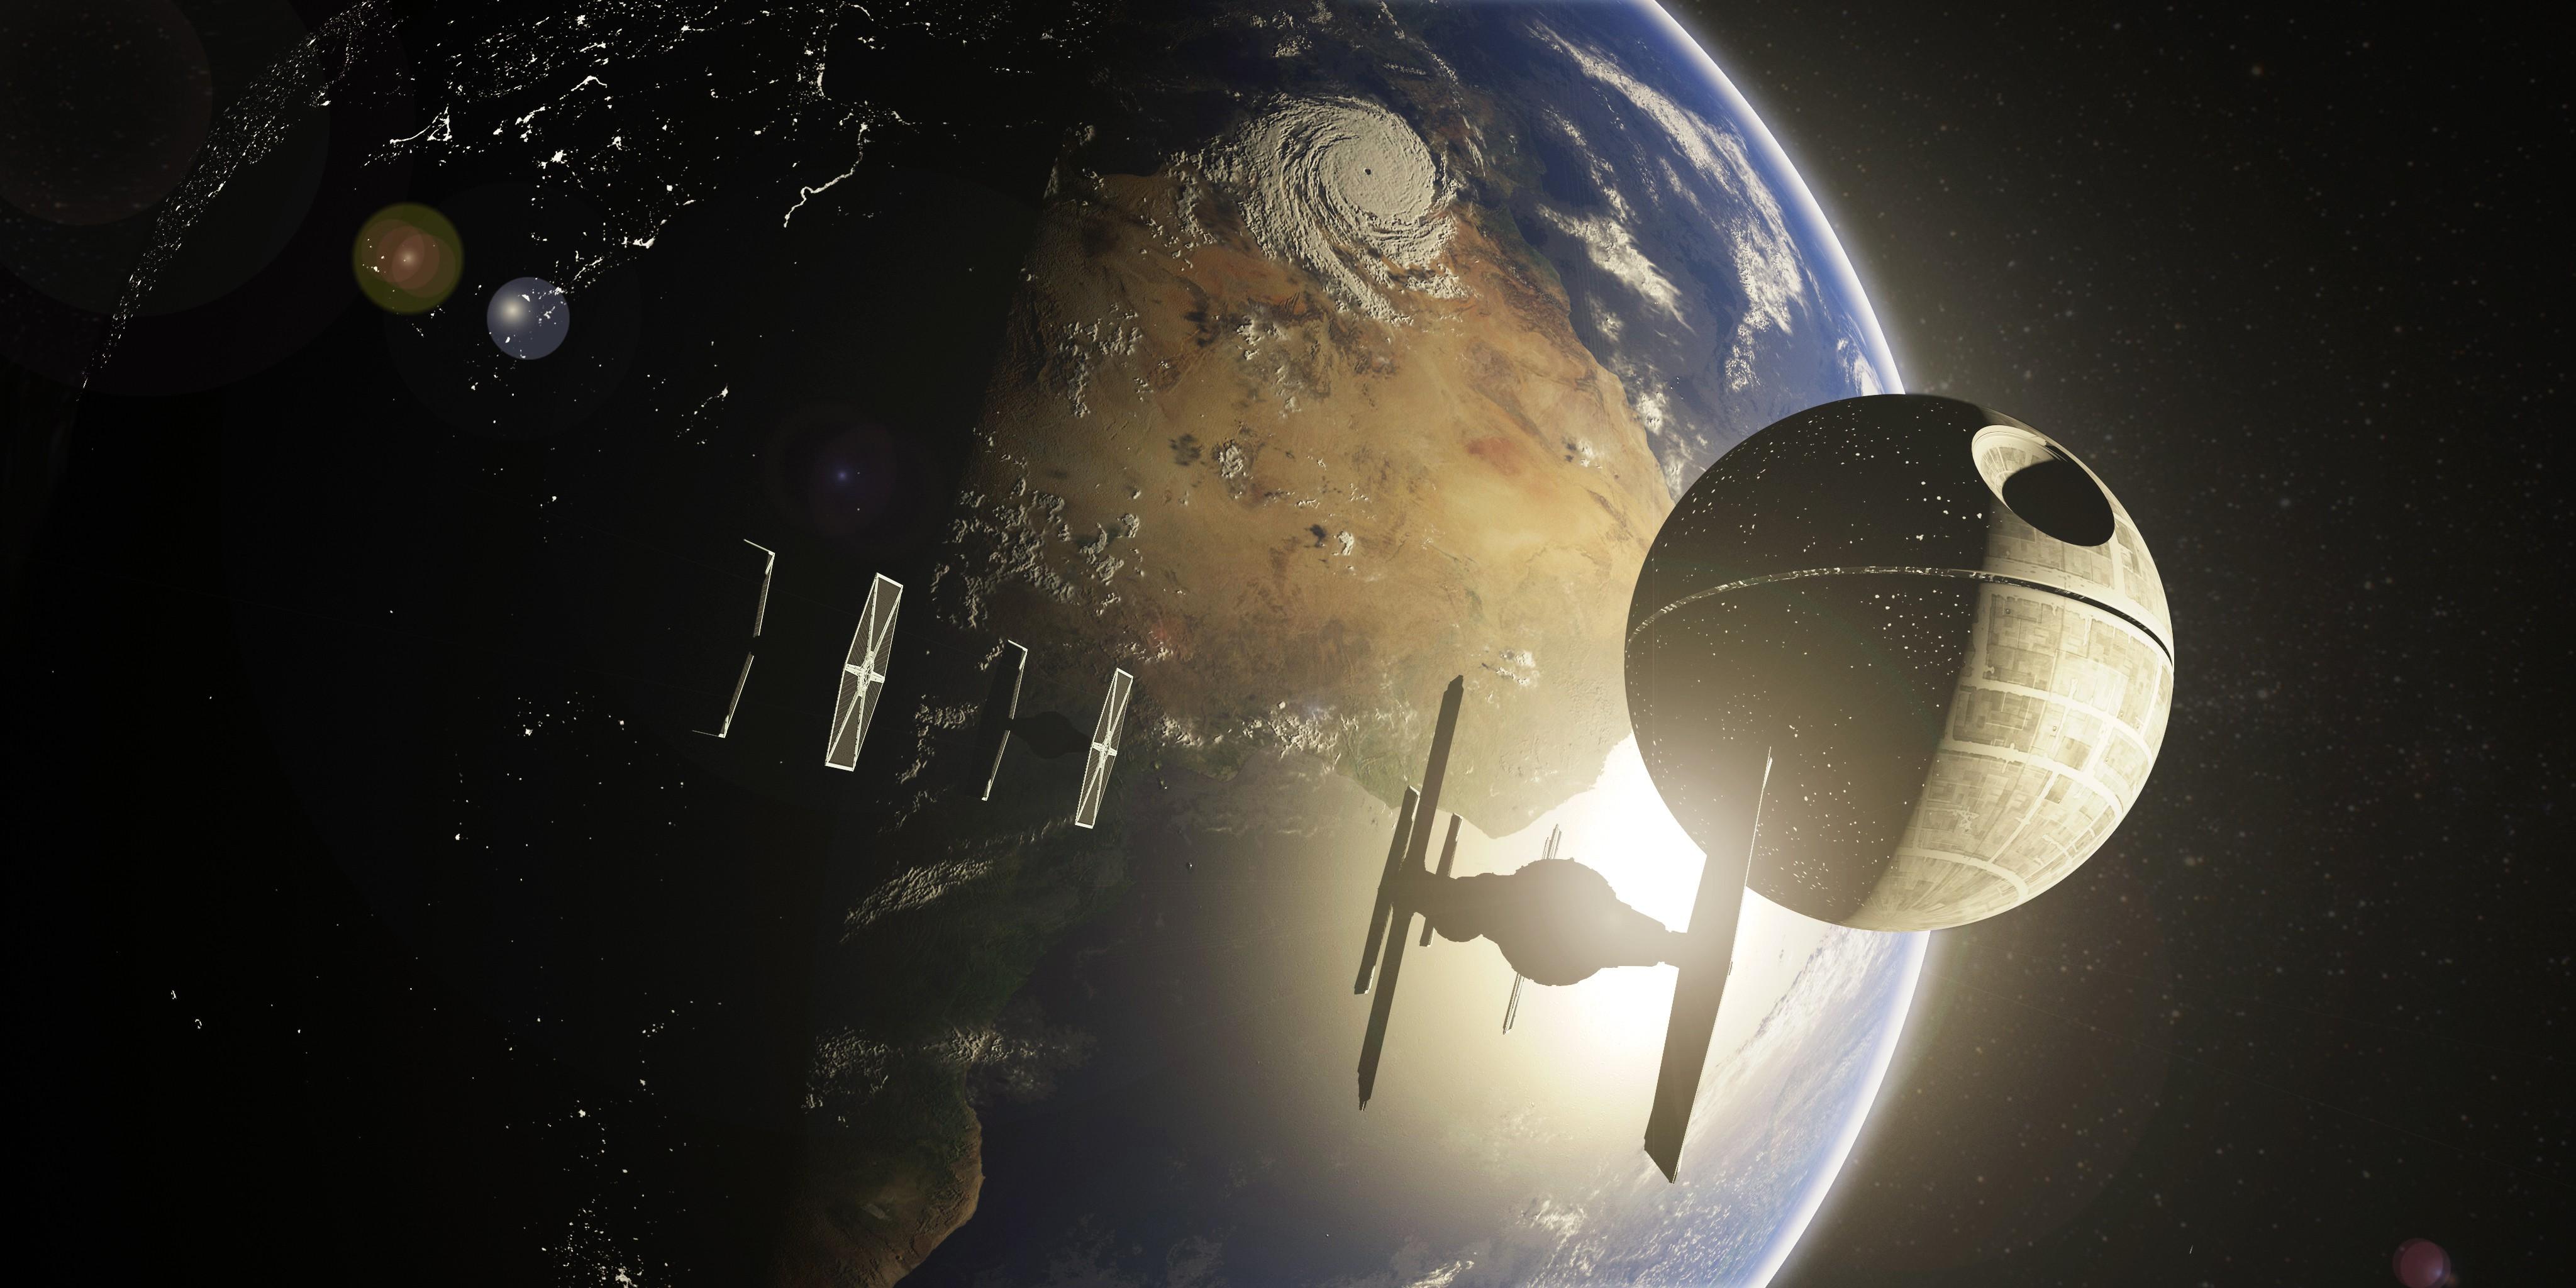 Wallpaper Star Wars Night Planet Sky Earth World Tie Fighter